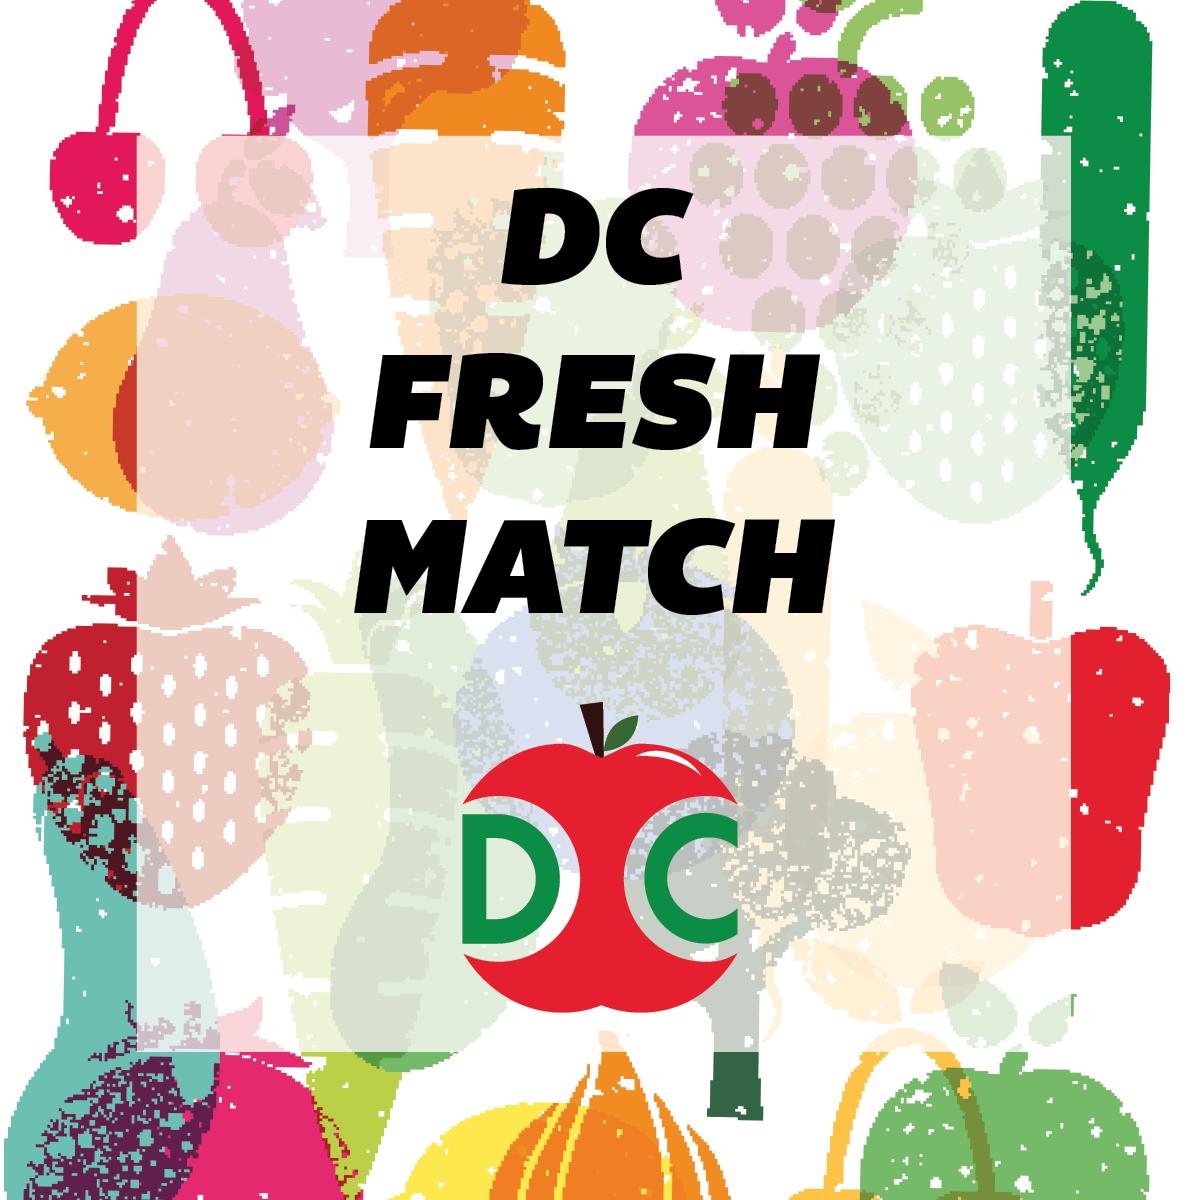 DC-FreshMatch-Icon-Square.png